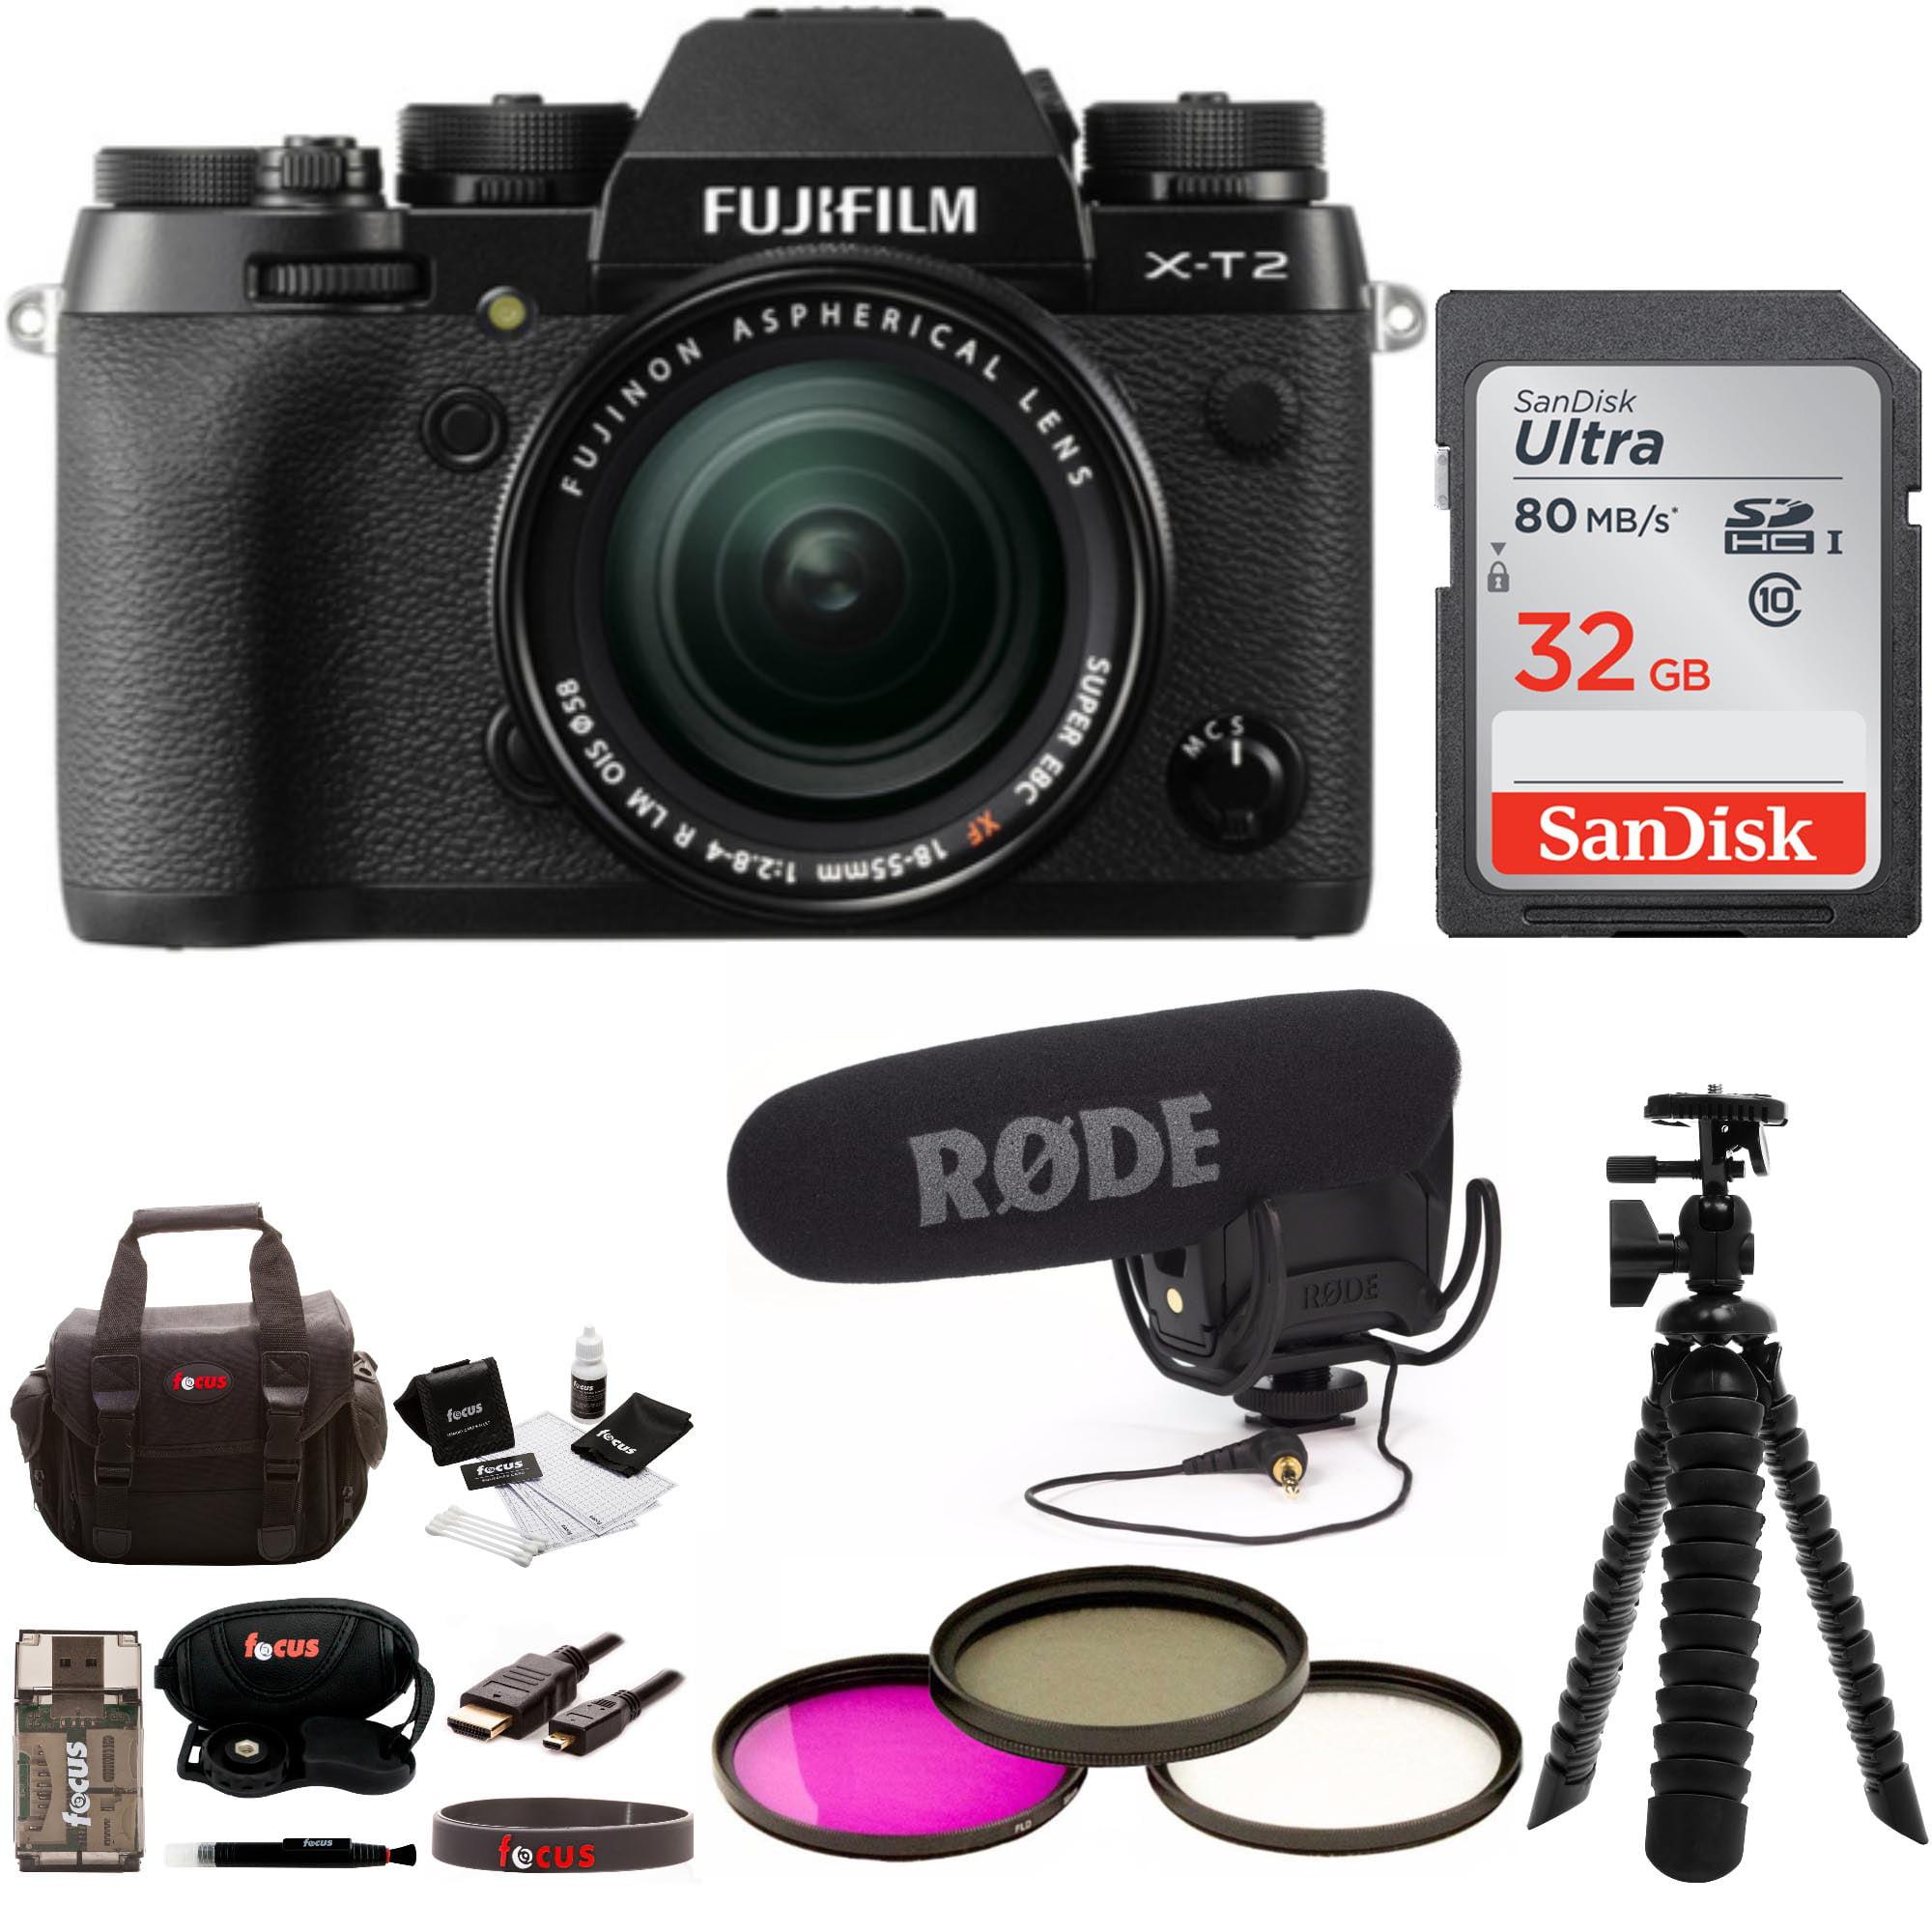 FujiFilm X-T2 Mirrorless Camera w 18-55mm Lens w Rode Mic Video Kit , Focus 32GB by Fujifilm